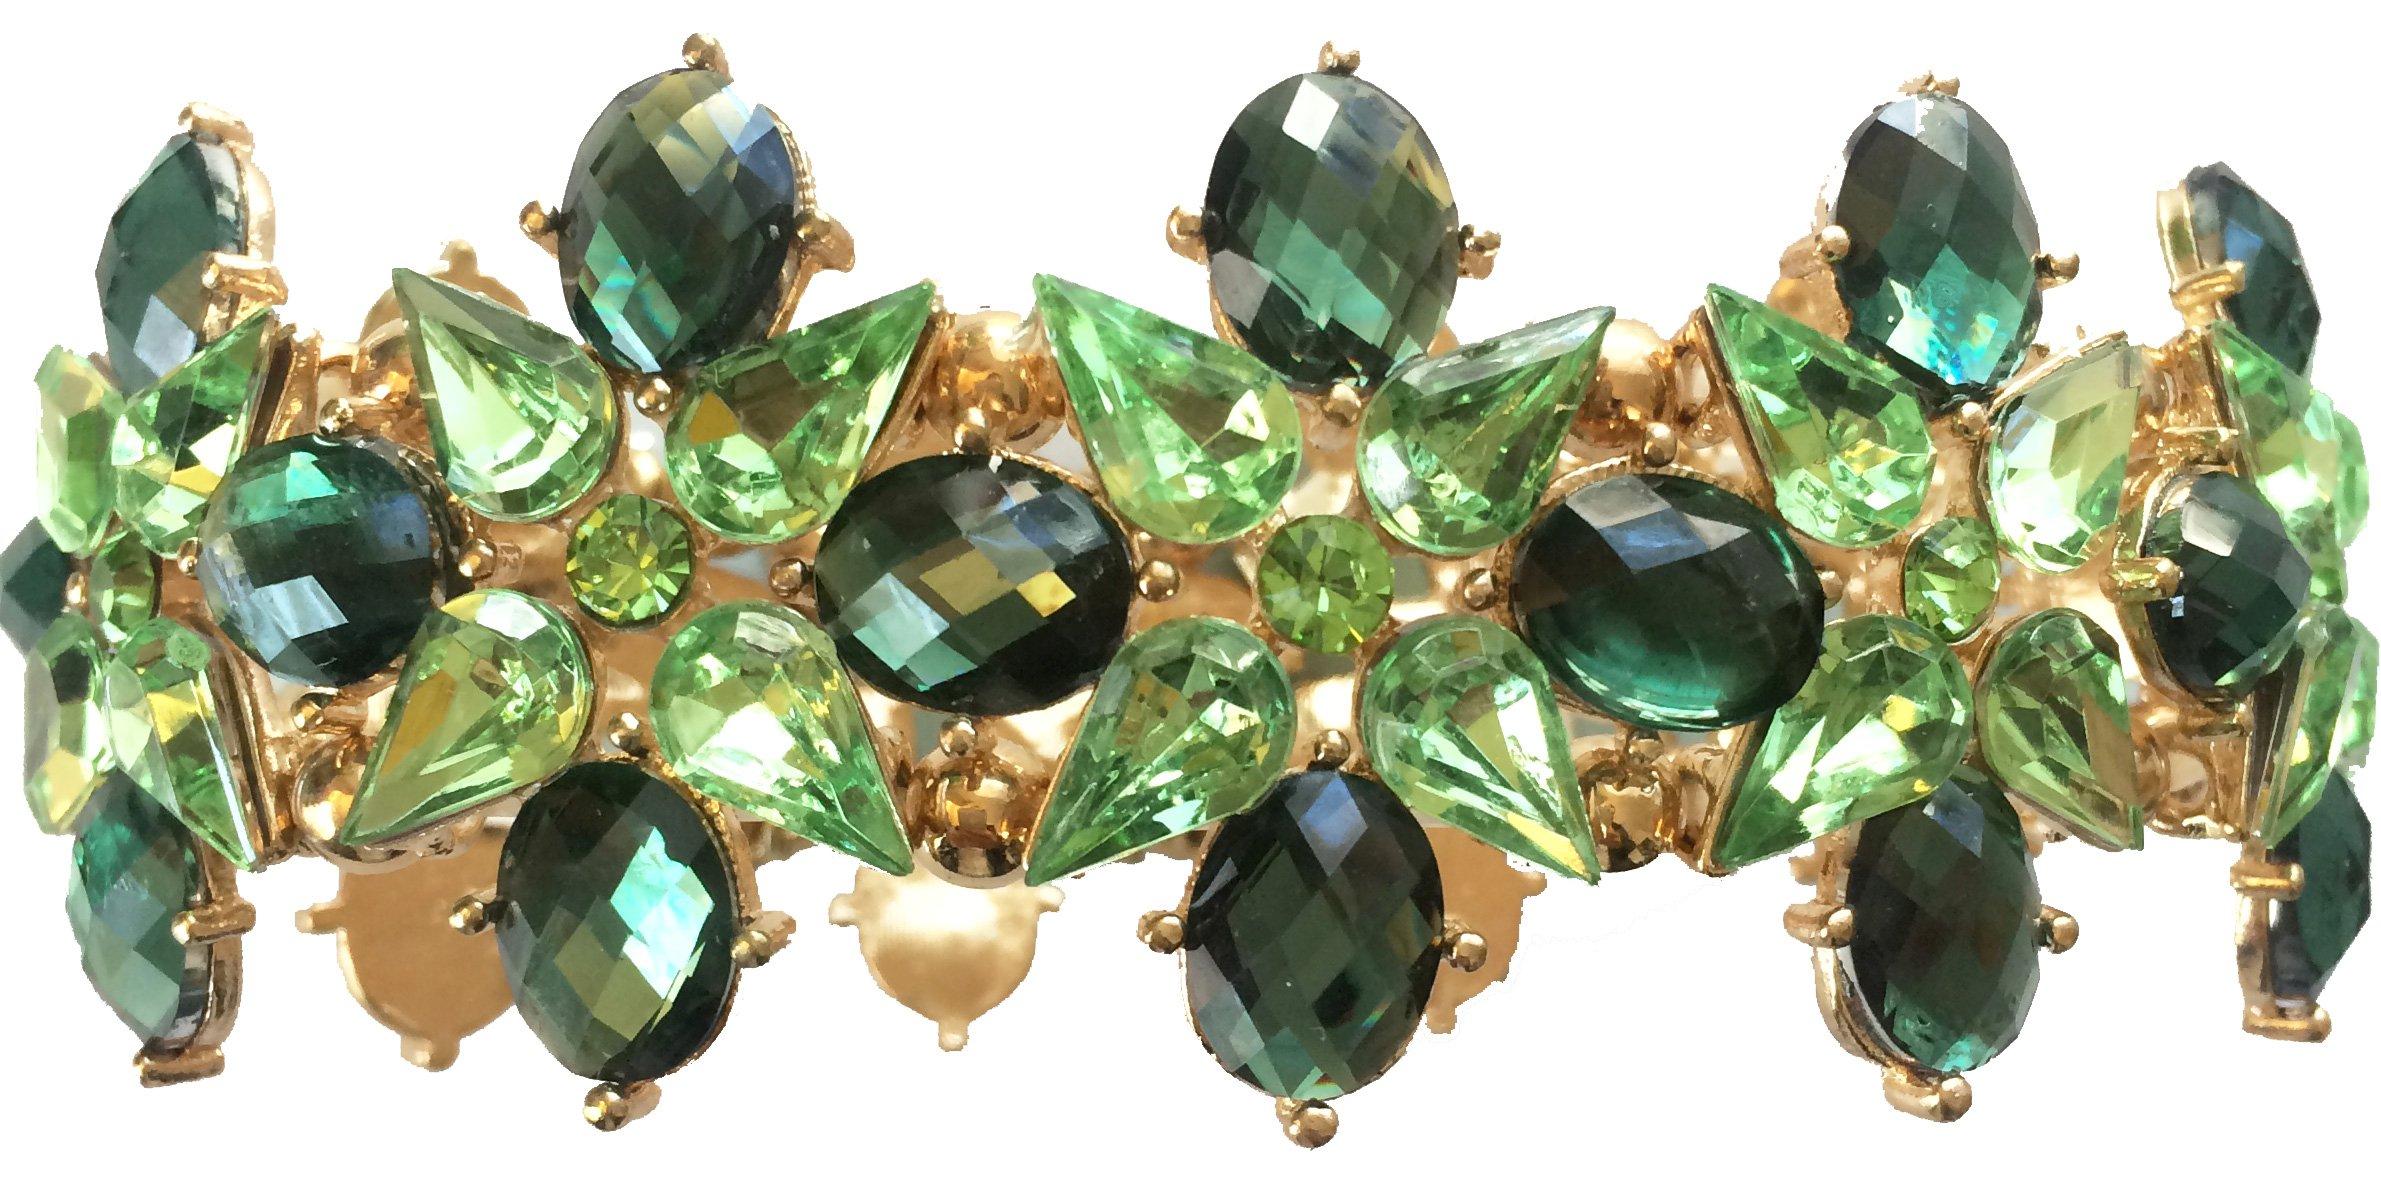 Vintage Antique Retro Deco Style Green Emerald Peridot Rhinestone Cluster Wedding Bridal Formal Prom Statement Cuff Bracelet